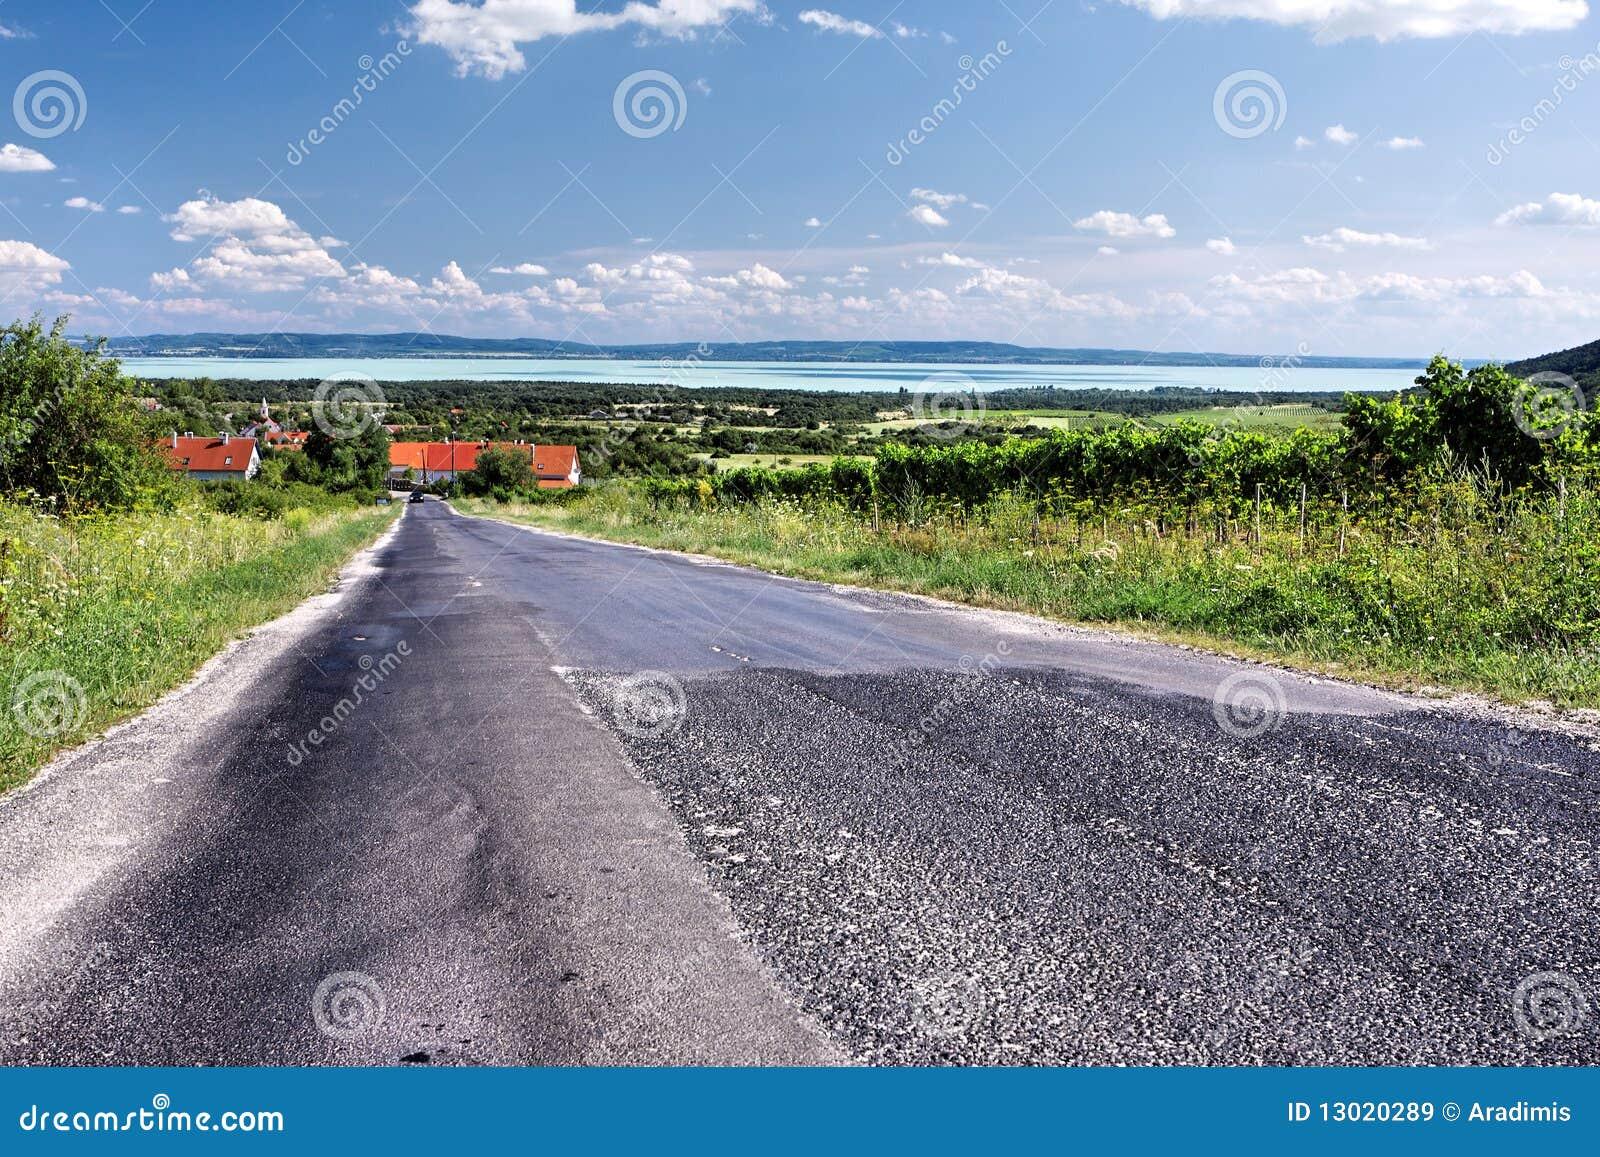 The uplands of Balaton 2